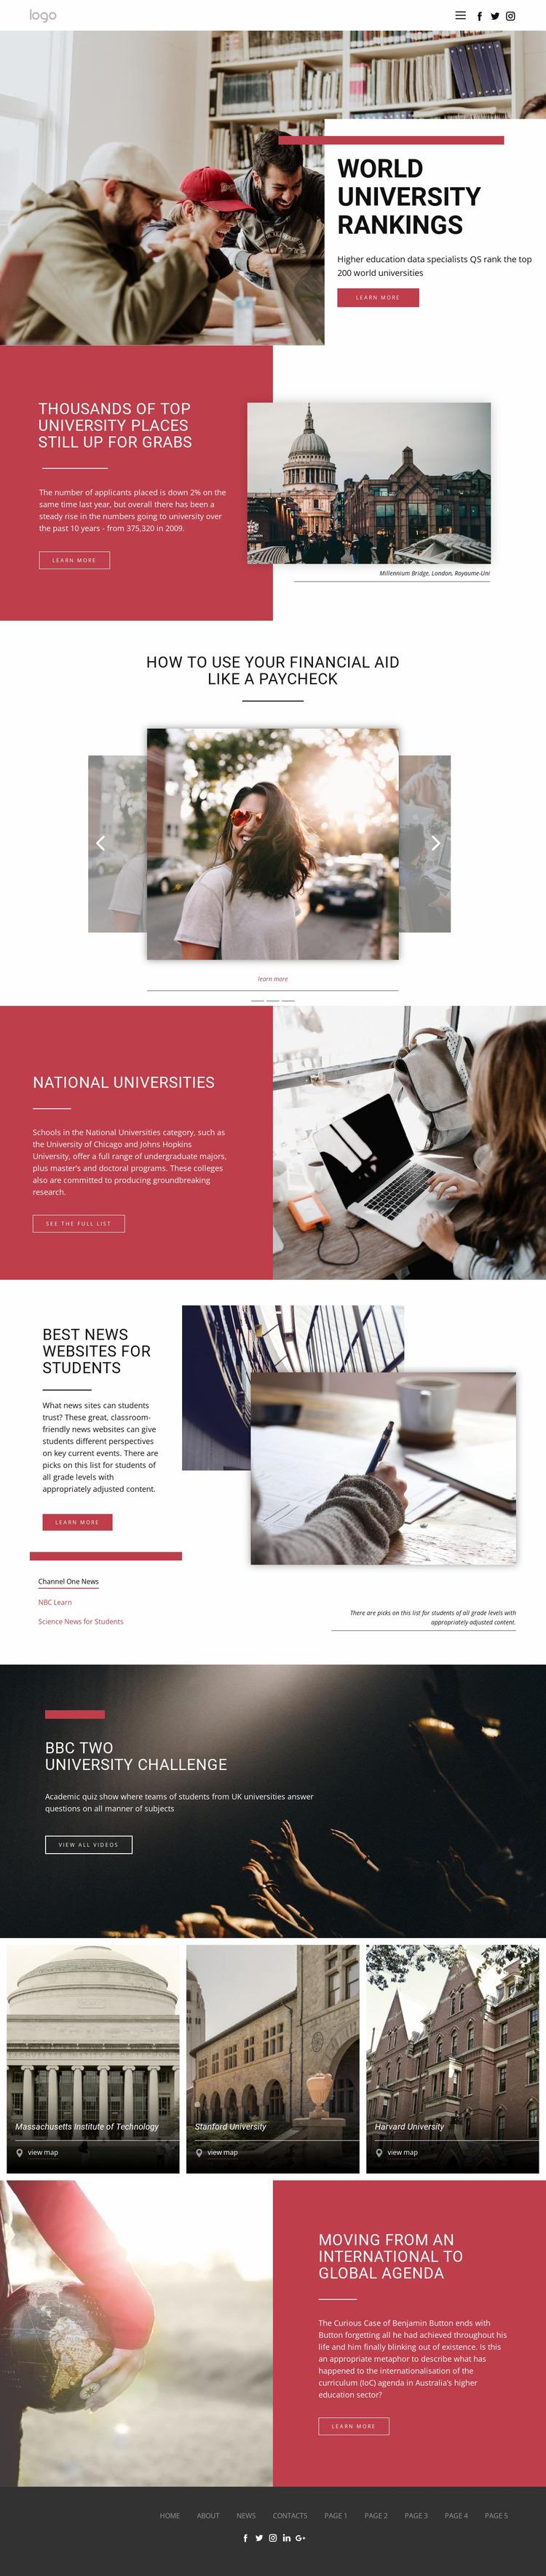 Ranking university education Website Mockup